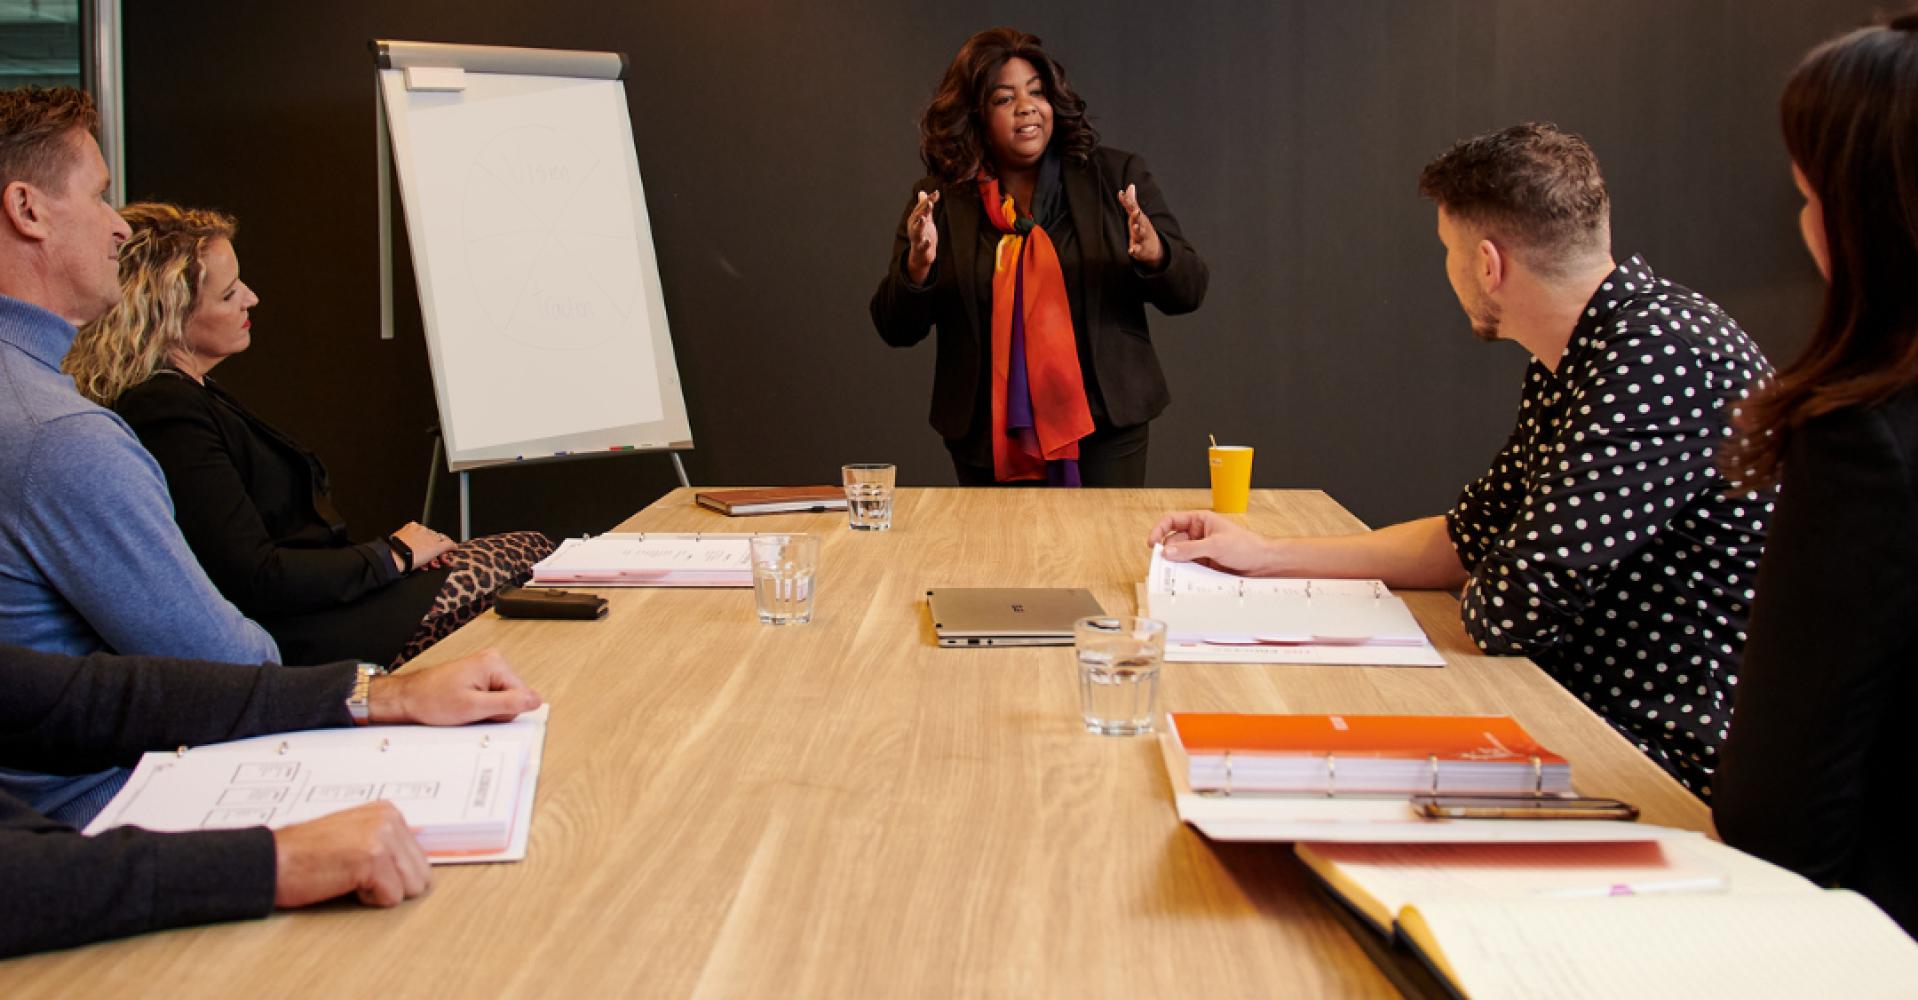 Angelique Piternella Share Business Management